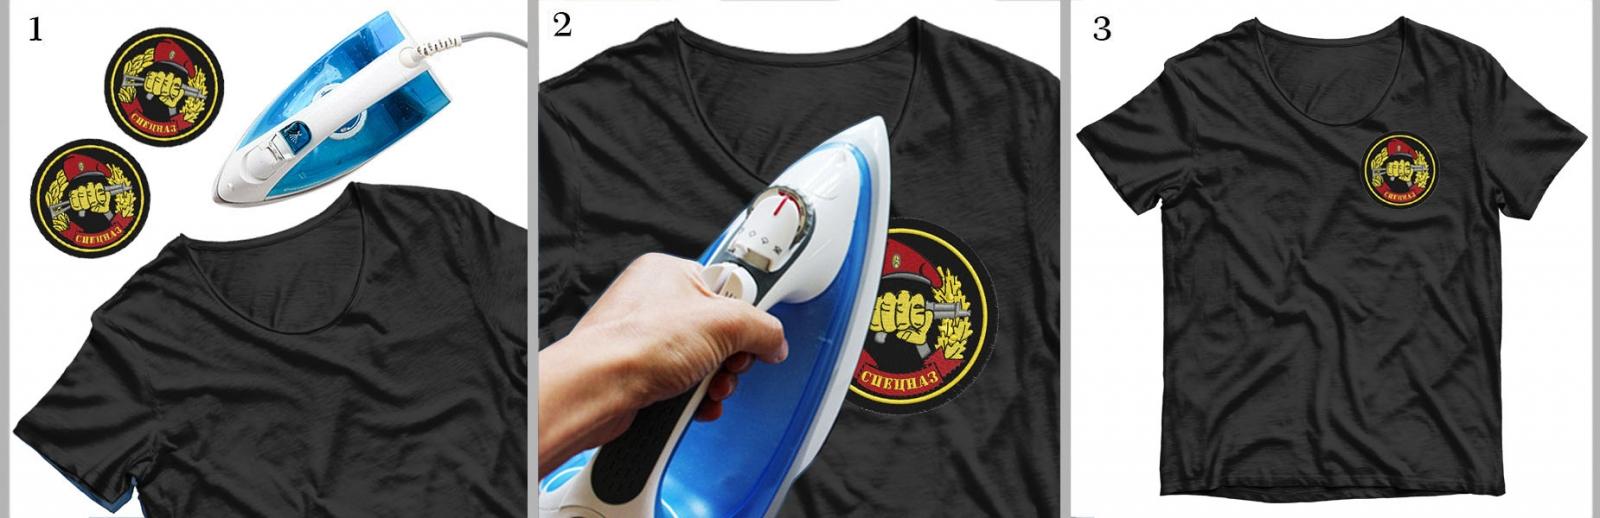 Шеврон Спецназа ВВ МВД на футболке